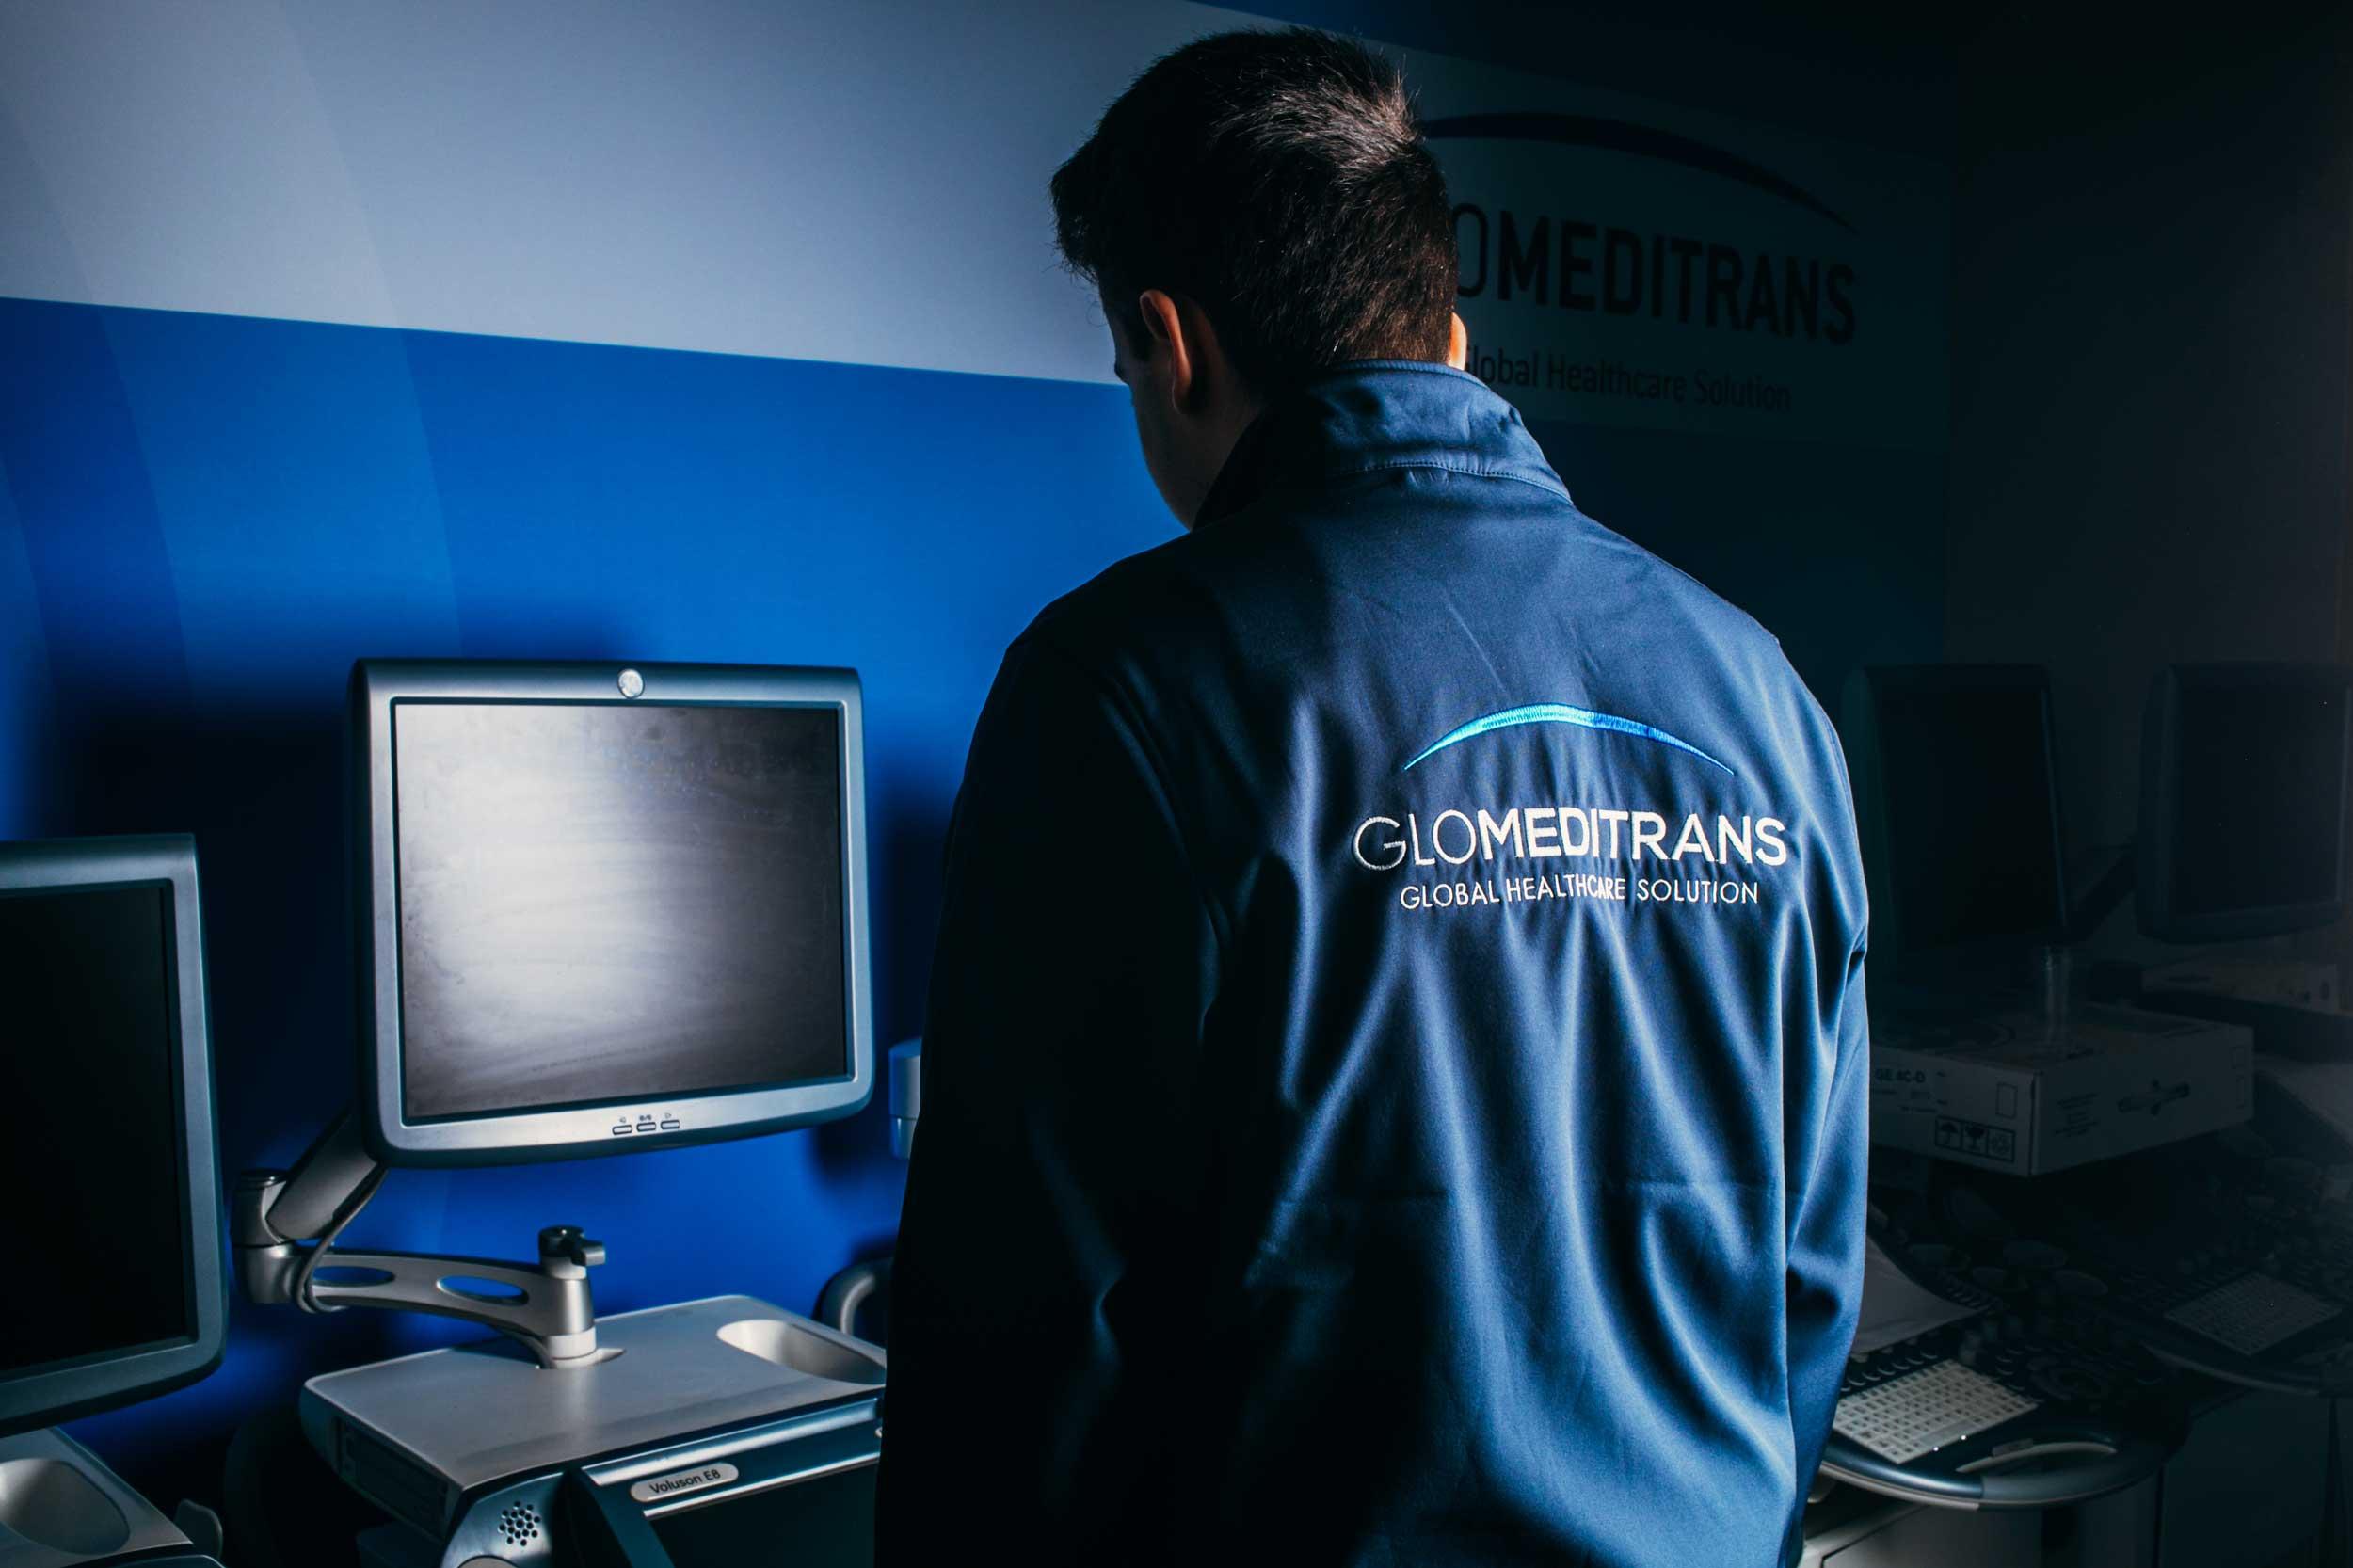 Glomeditrans Gebrauchte Medizintechnik GE Healtcare Ultraschallgerät